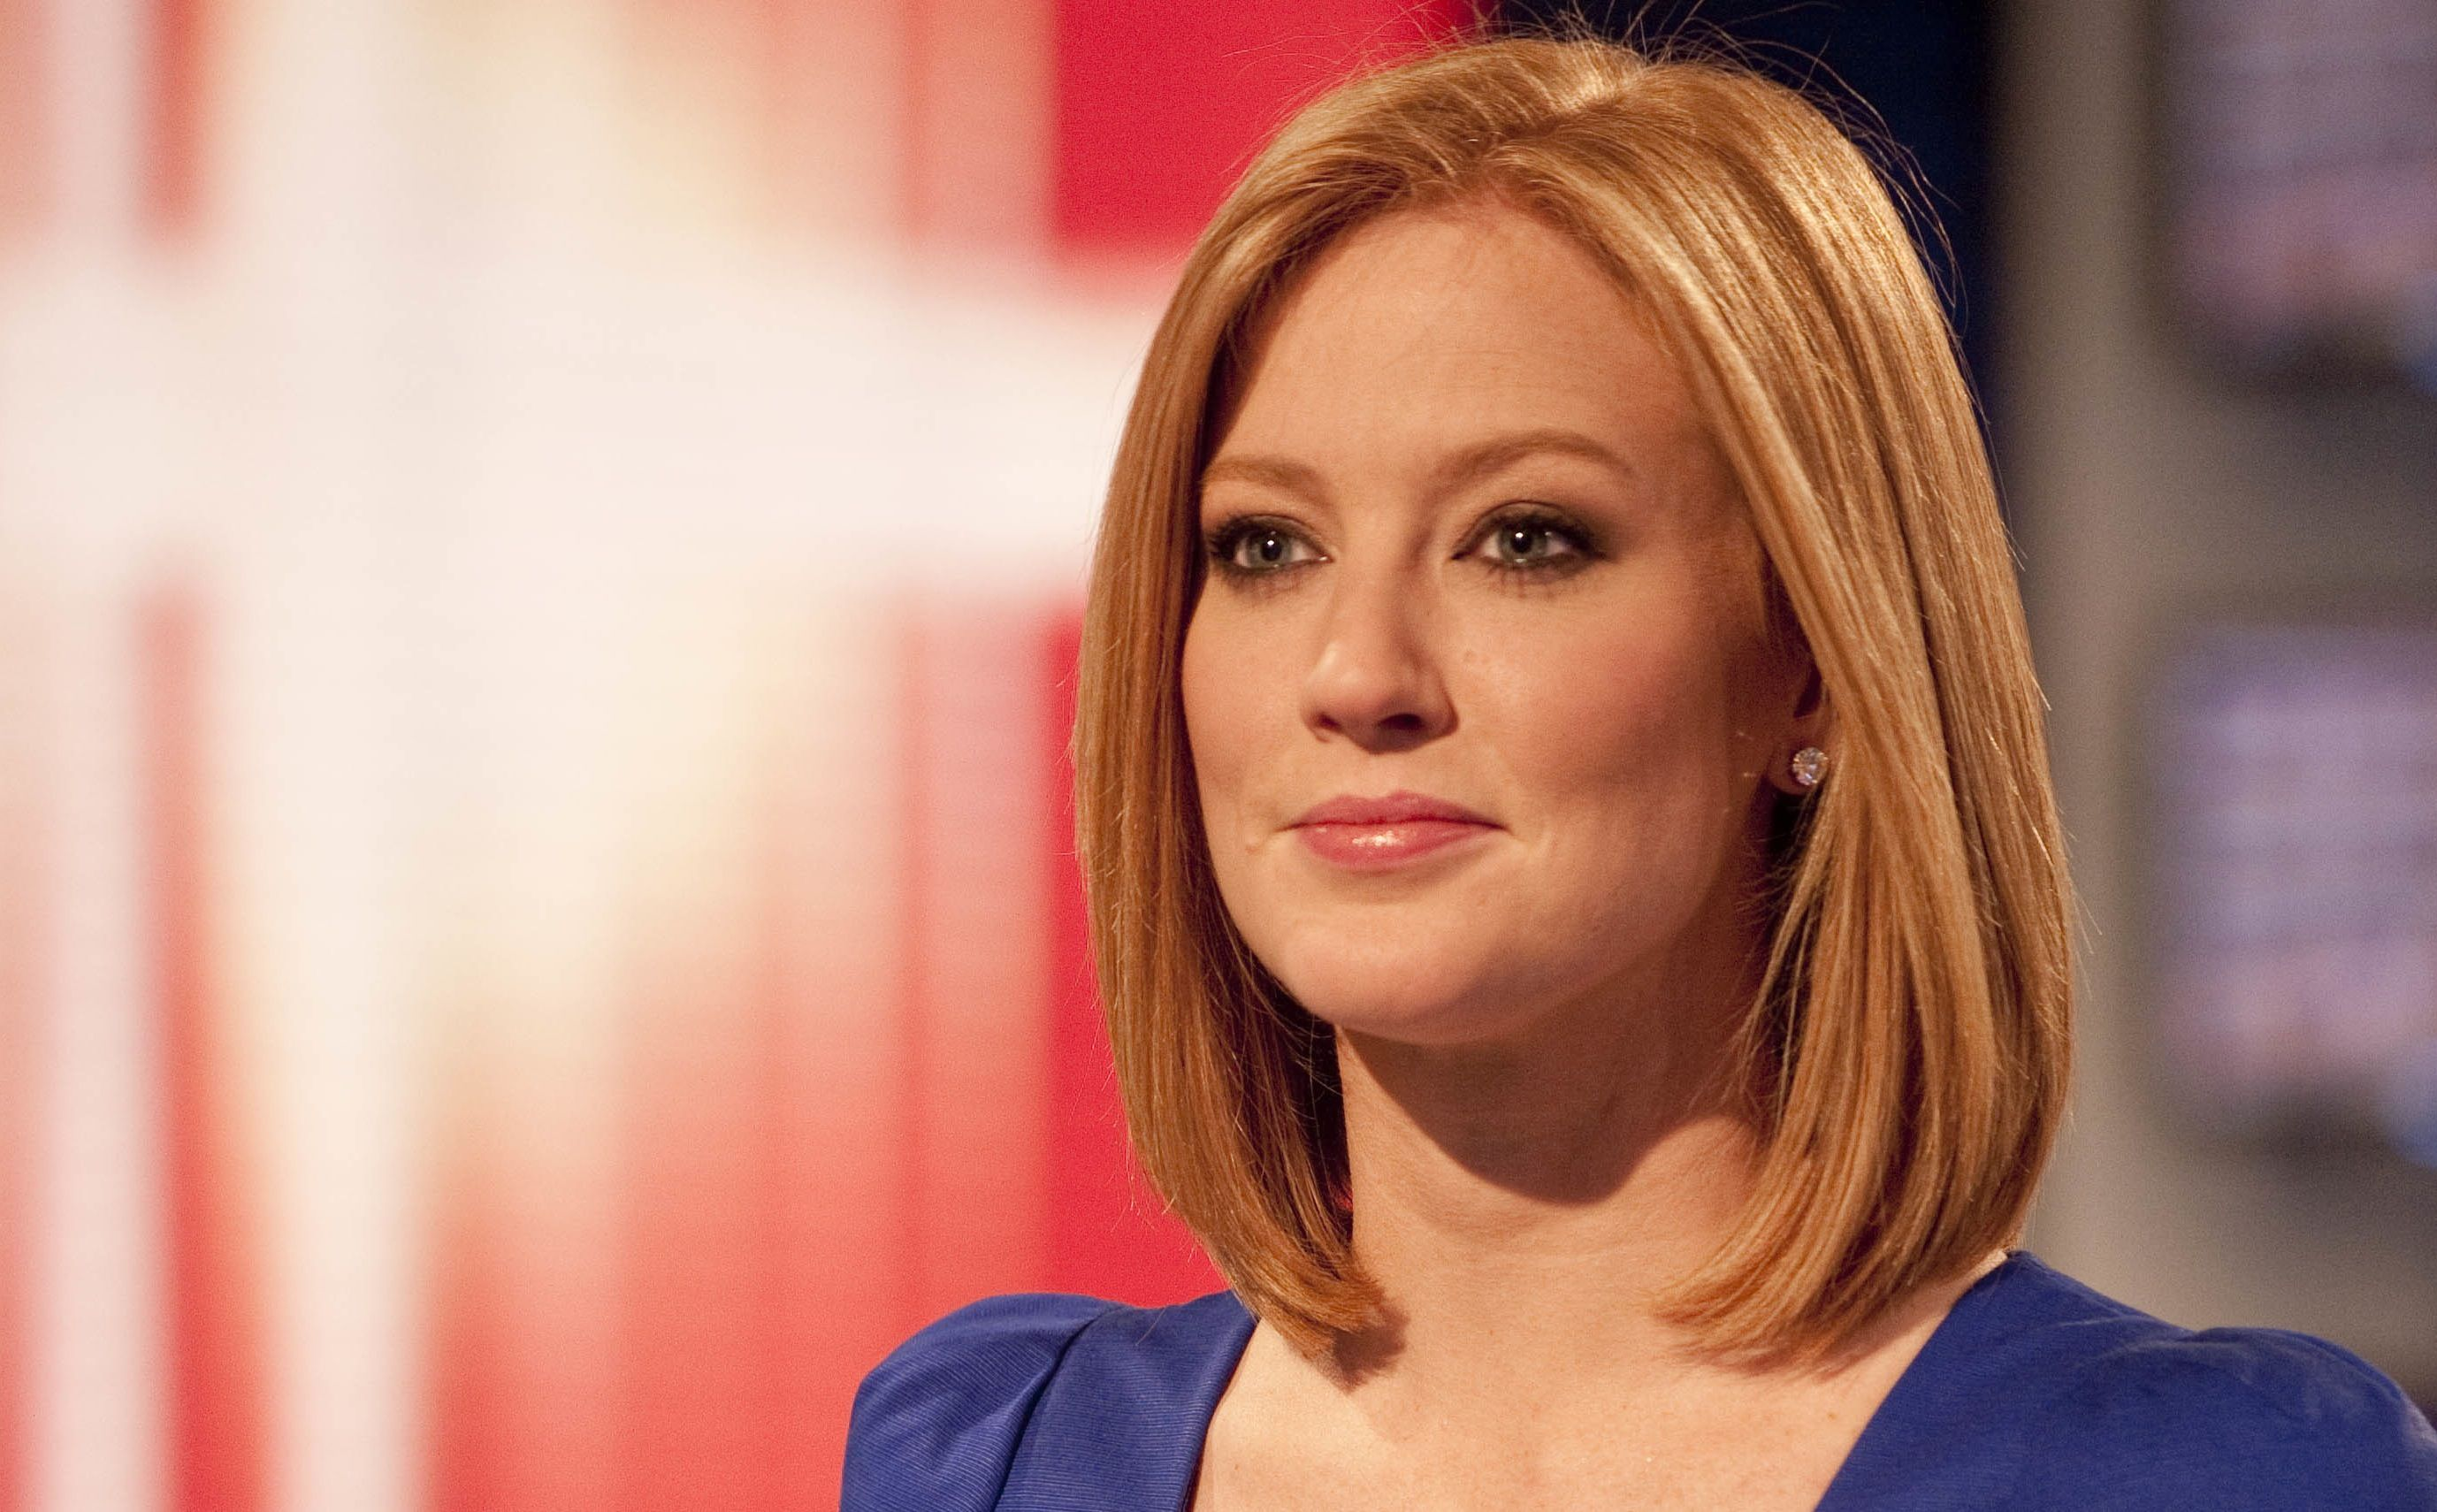 News presenter sky female redhead